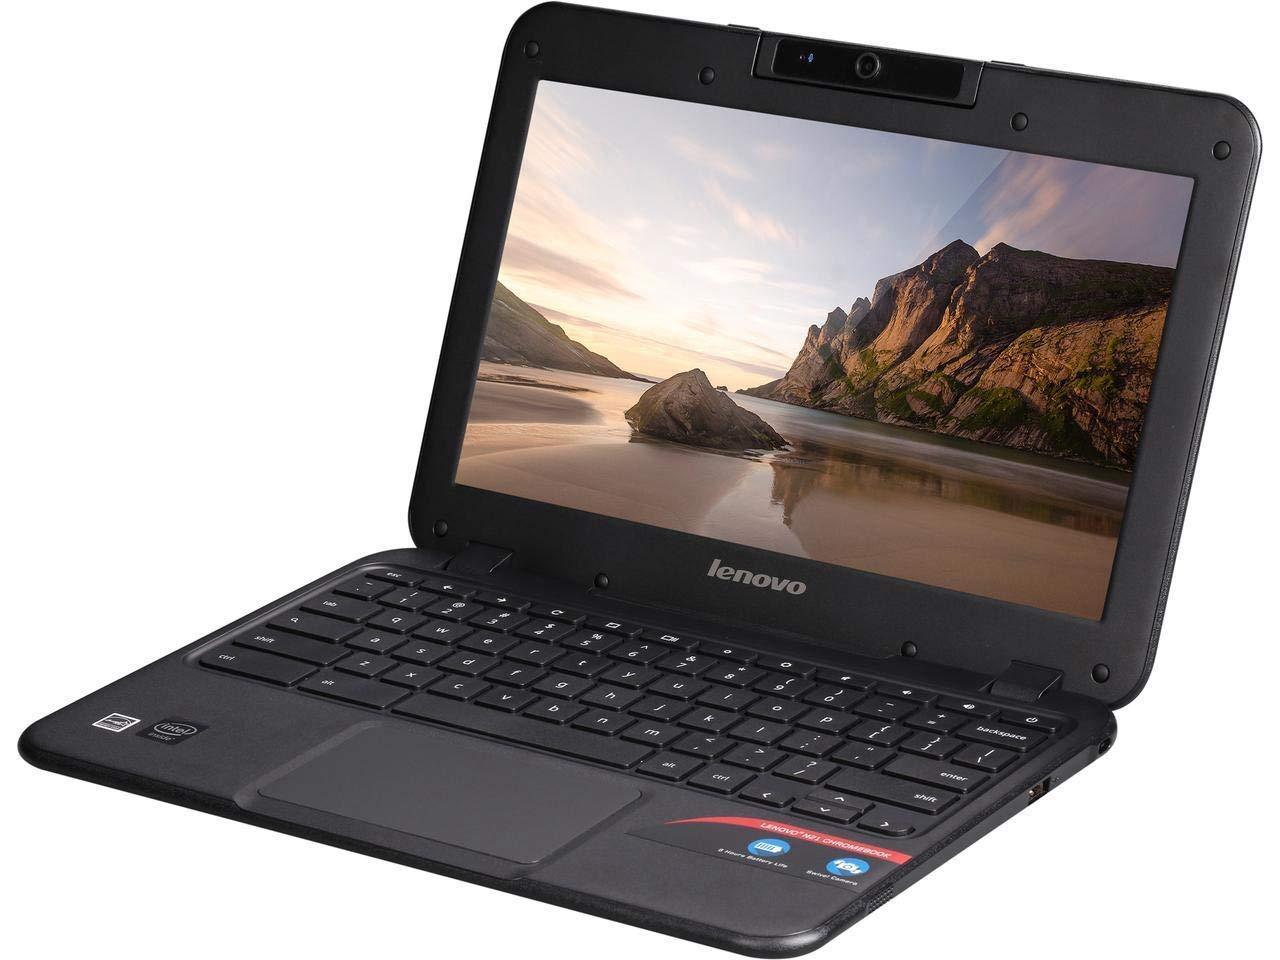 Lenovo 80MG0001US-RB-AMZ2 N21 11.6 HD 16GB SD Chromebook Intel Celeron N2840 2GB Wi-Fi Bluetooth Black Renewed